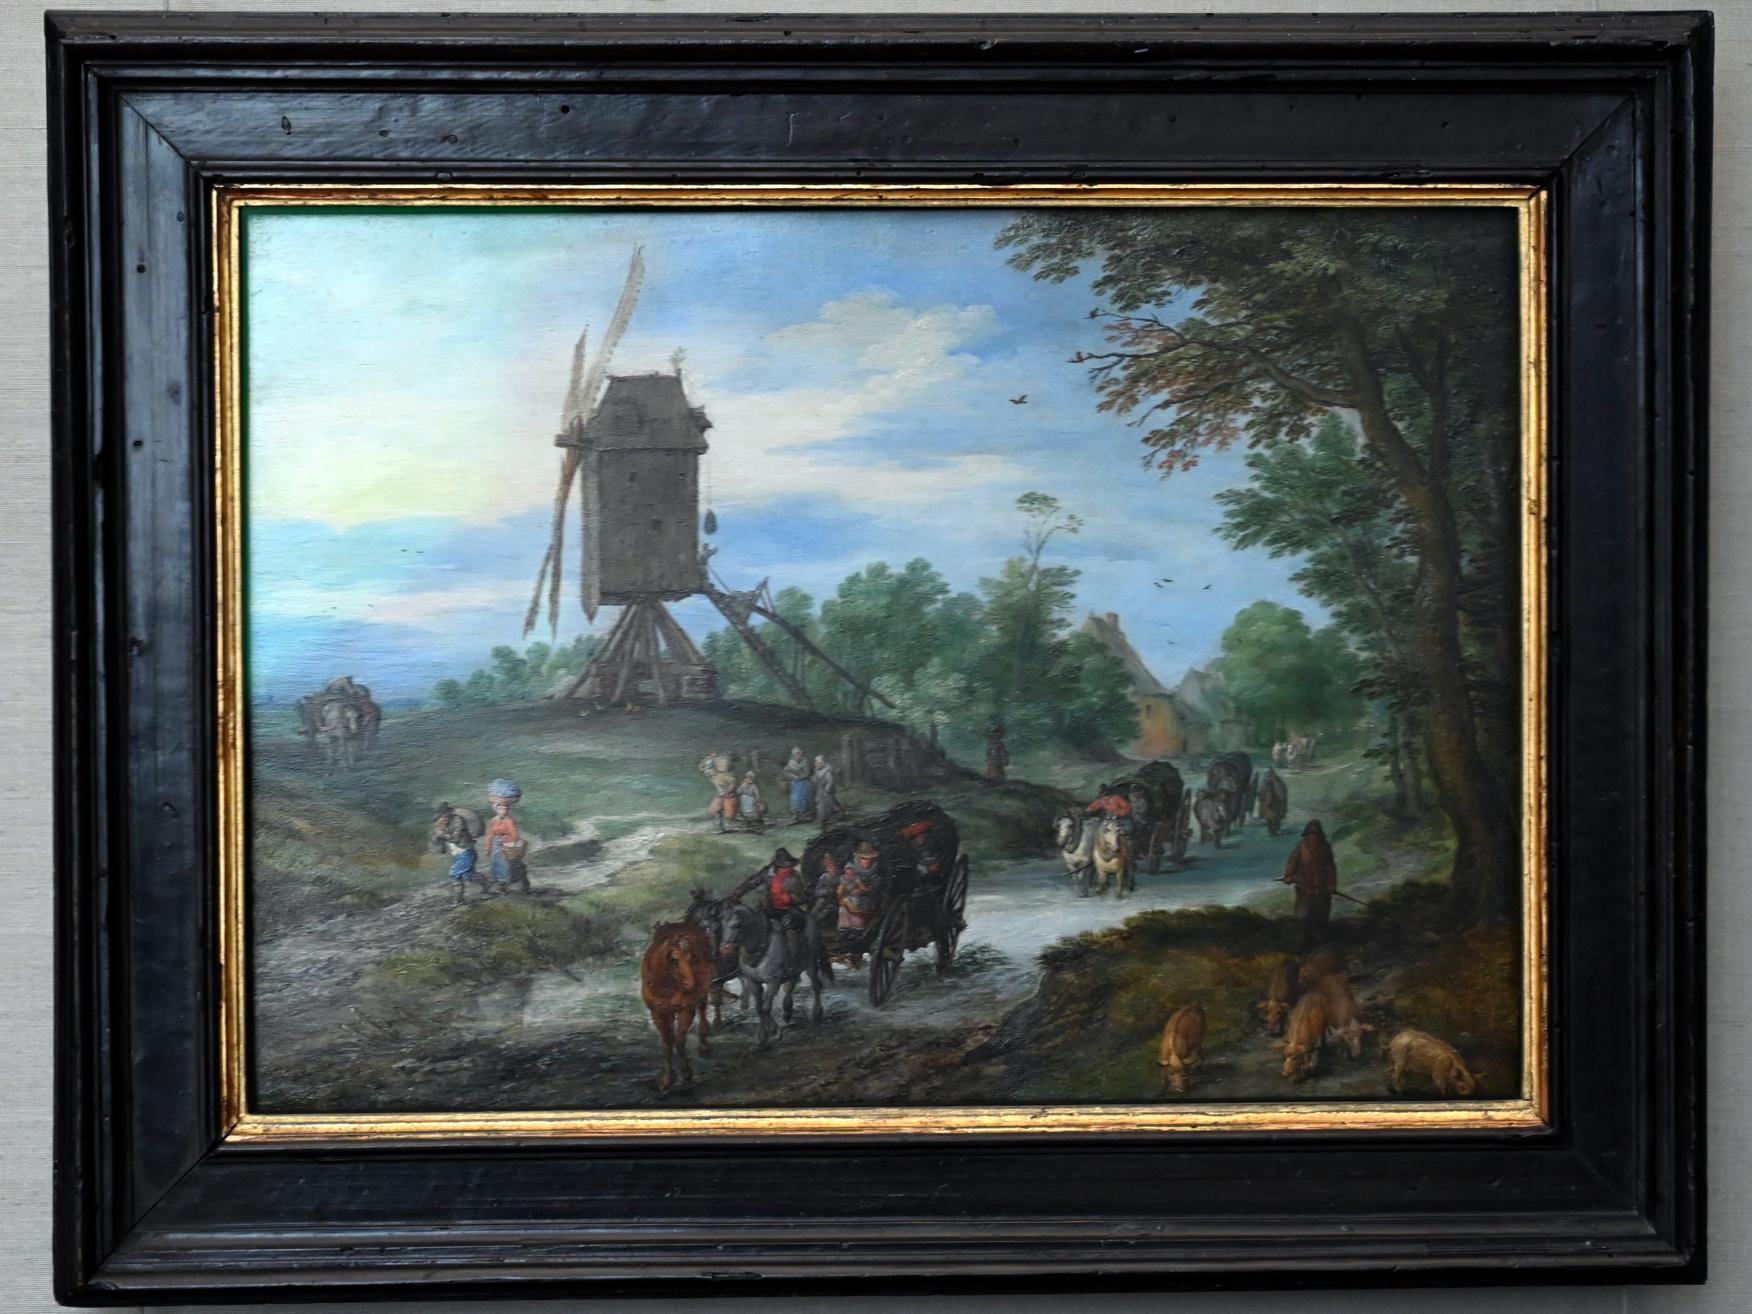 Jan Brueghel der Ältere (Blumenbrueghel): Überschwemmte Landstraße, 1614